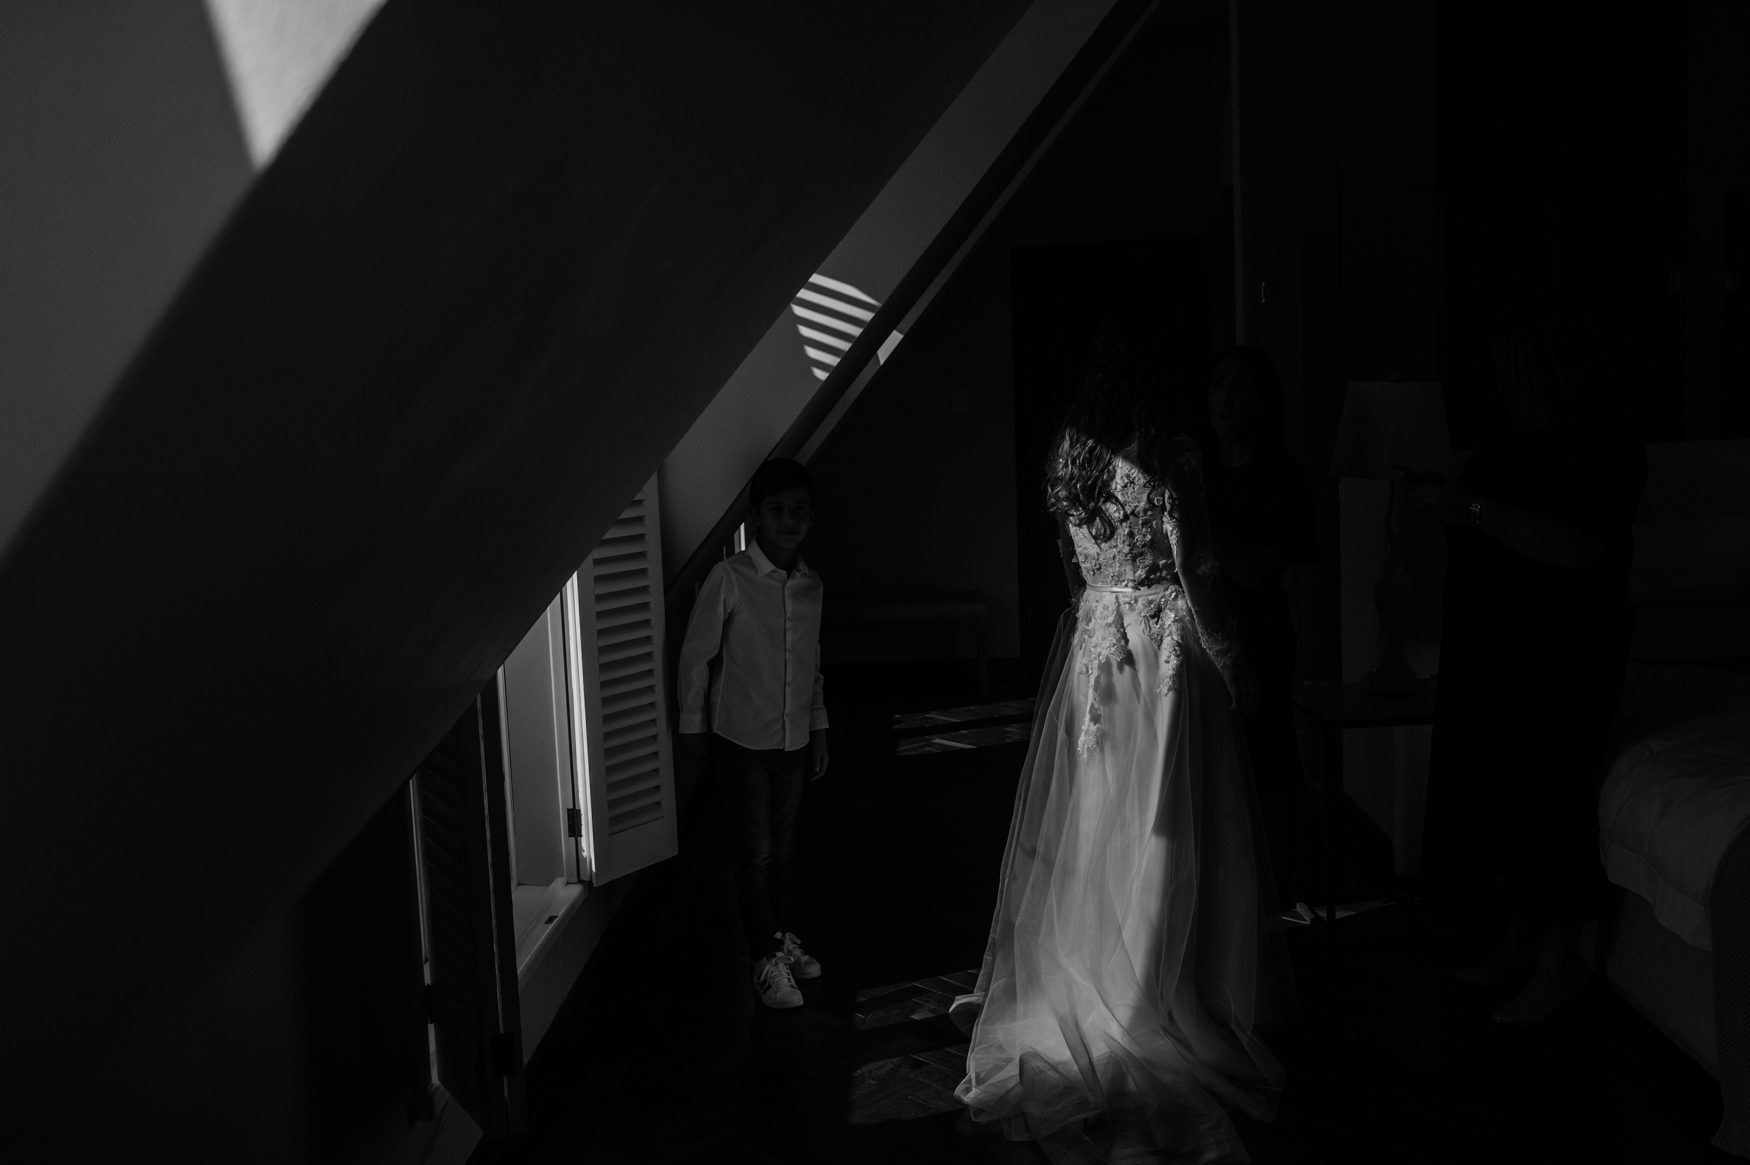 Leon_&_Martine's_Wedding_Photographs_17th_April_2019_@johnhenryweddingphoto_Low_Resolution_Web-158.JPG